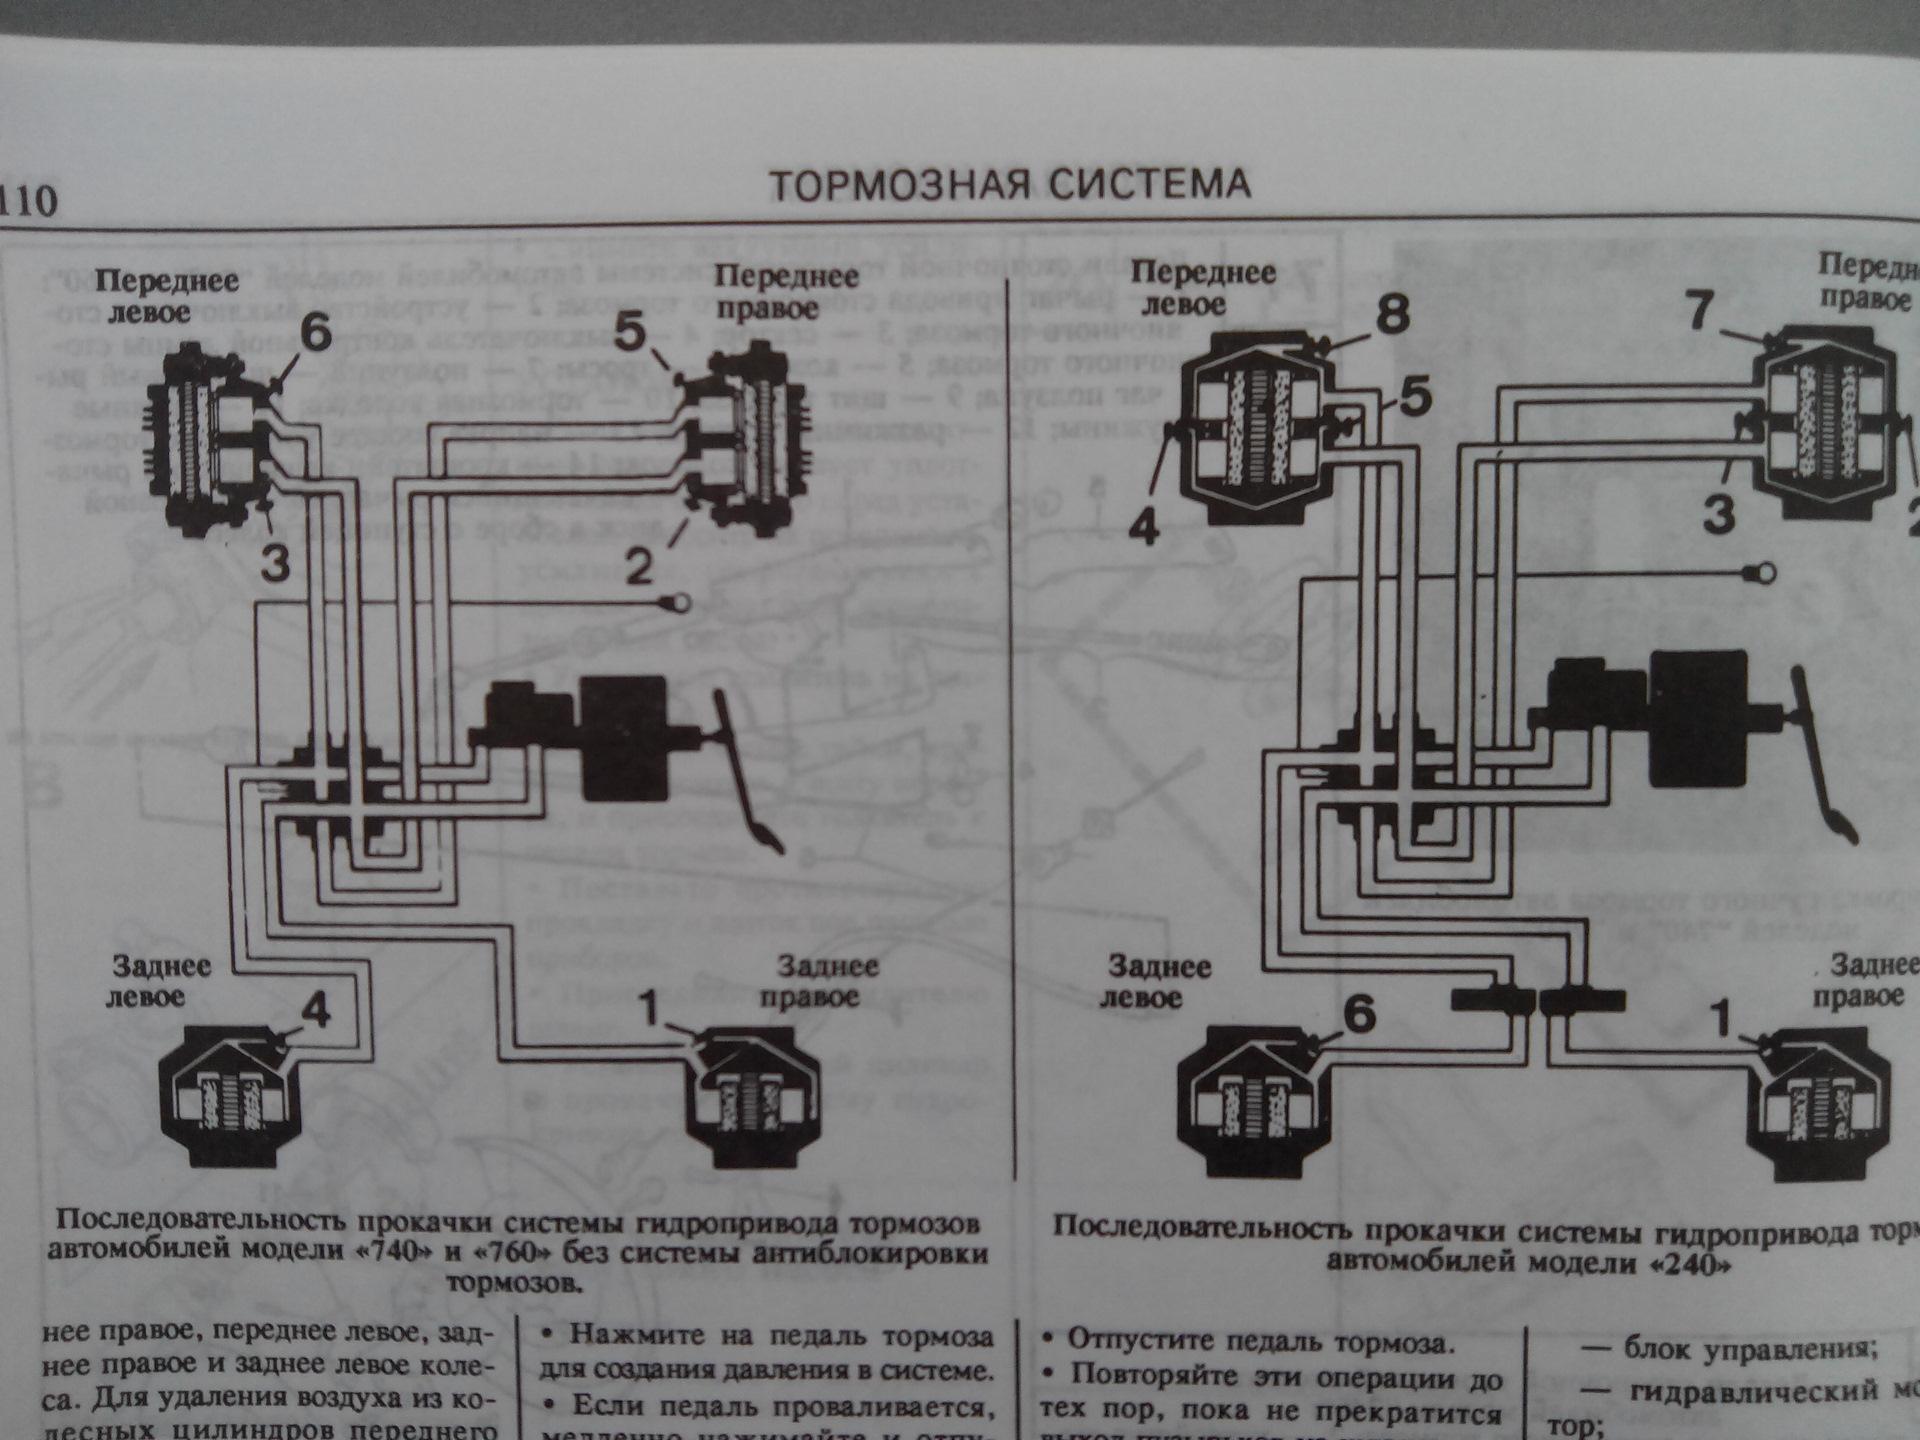 система тормозов вольво